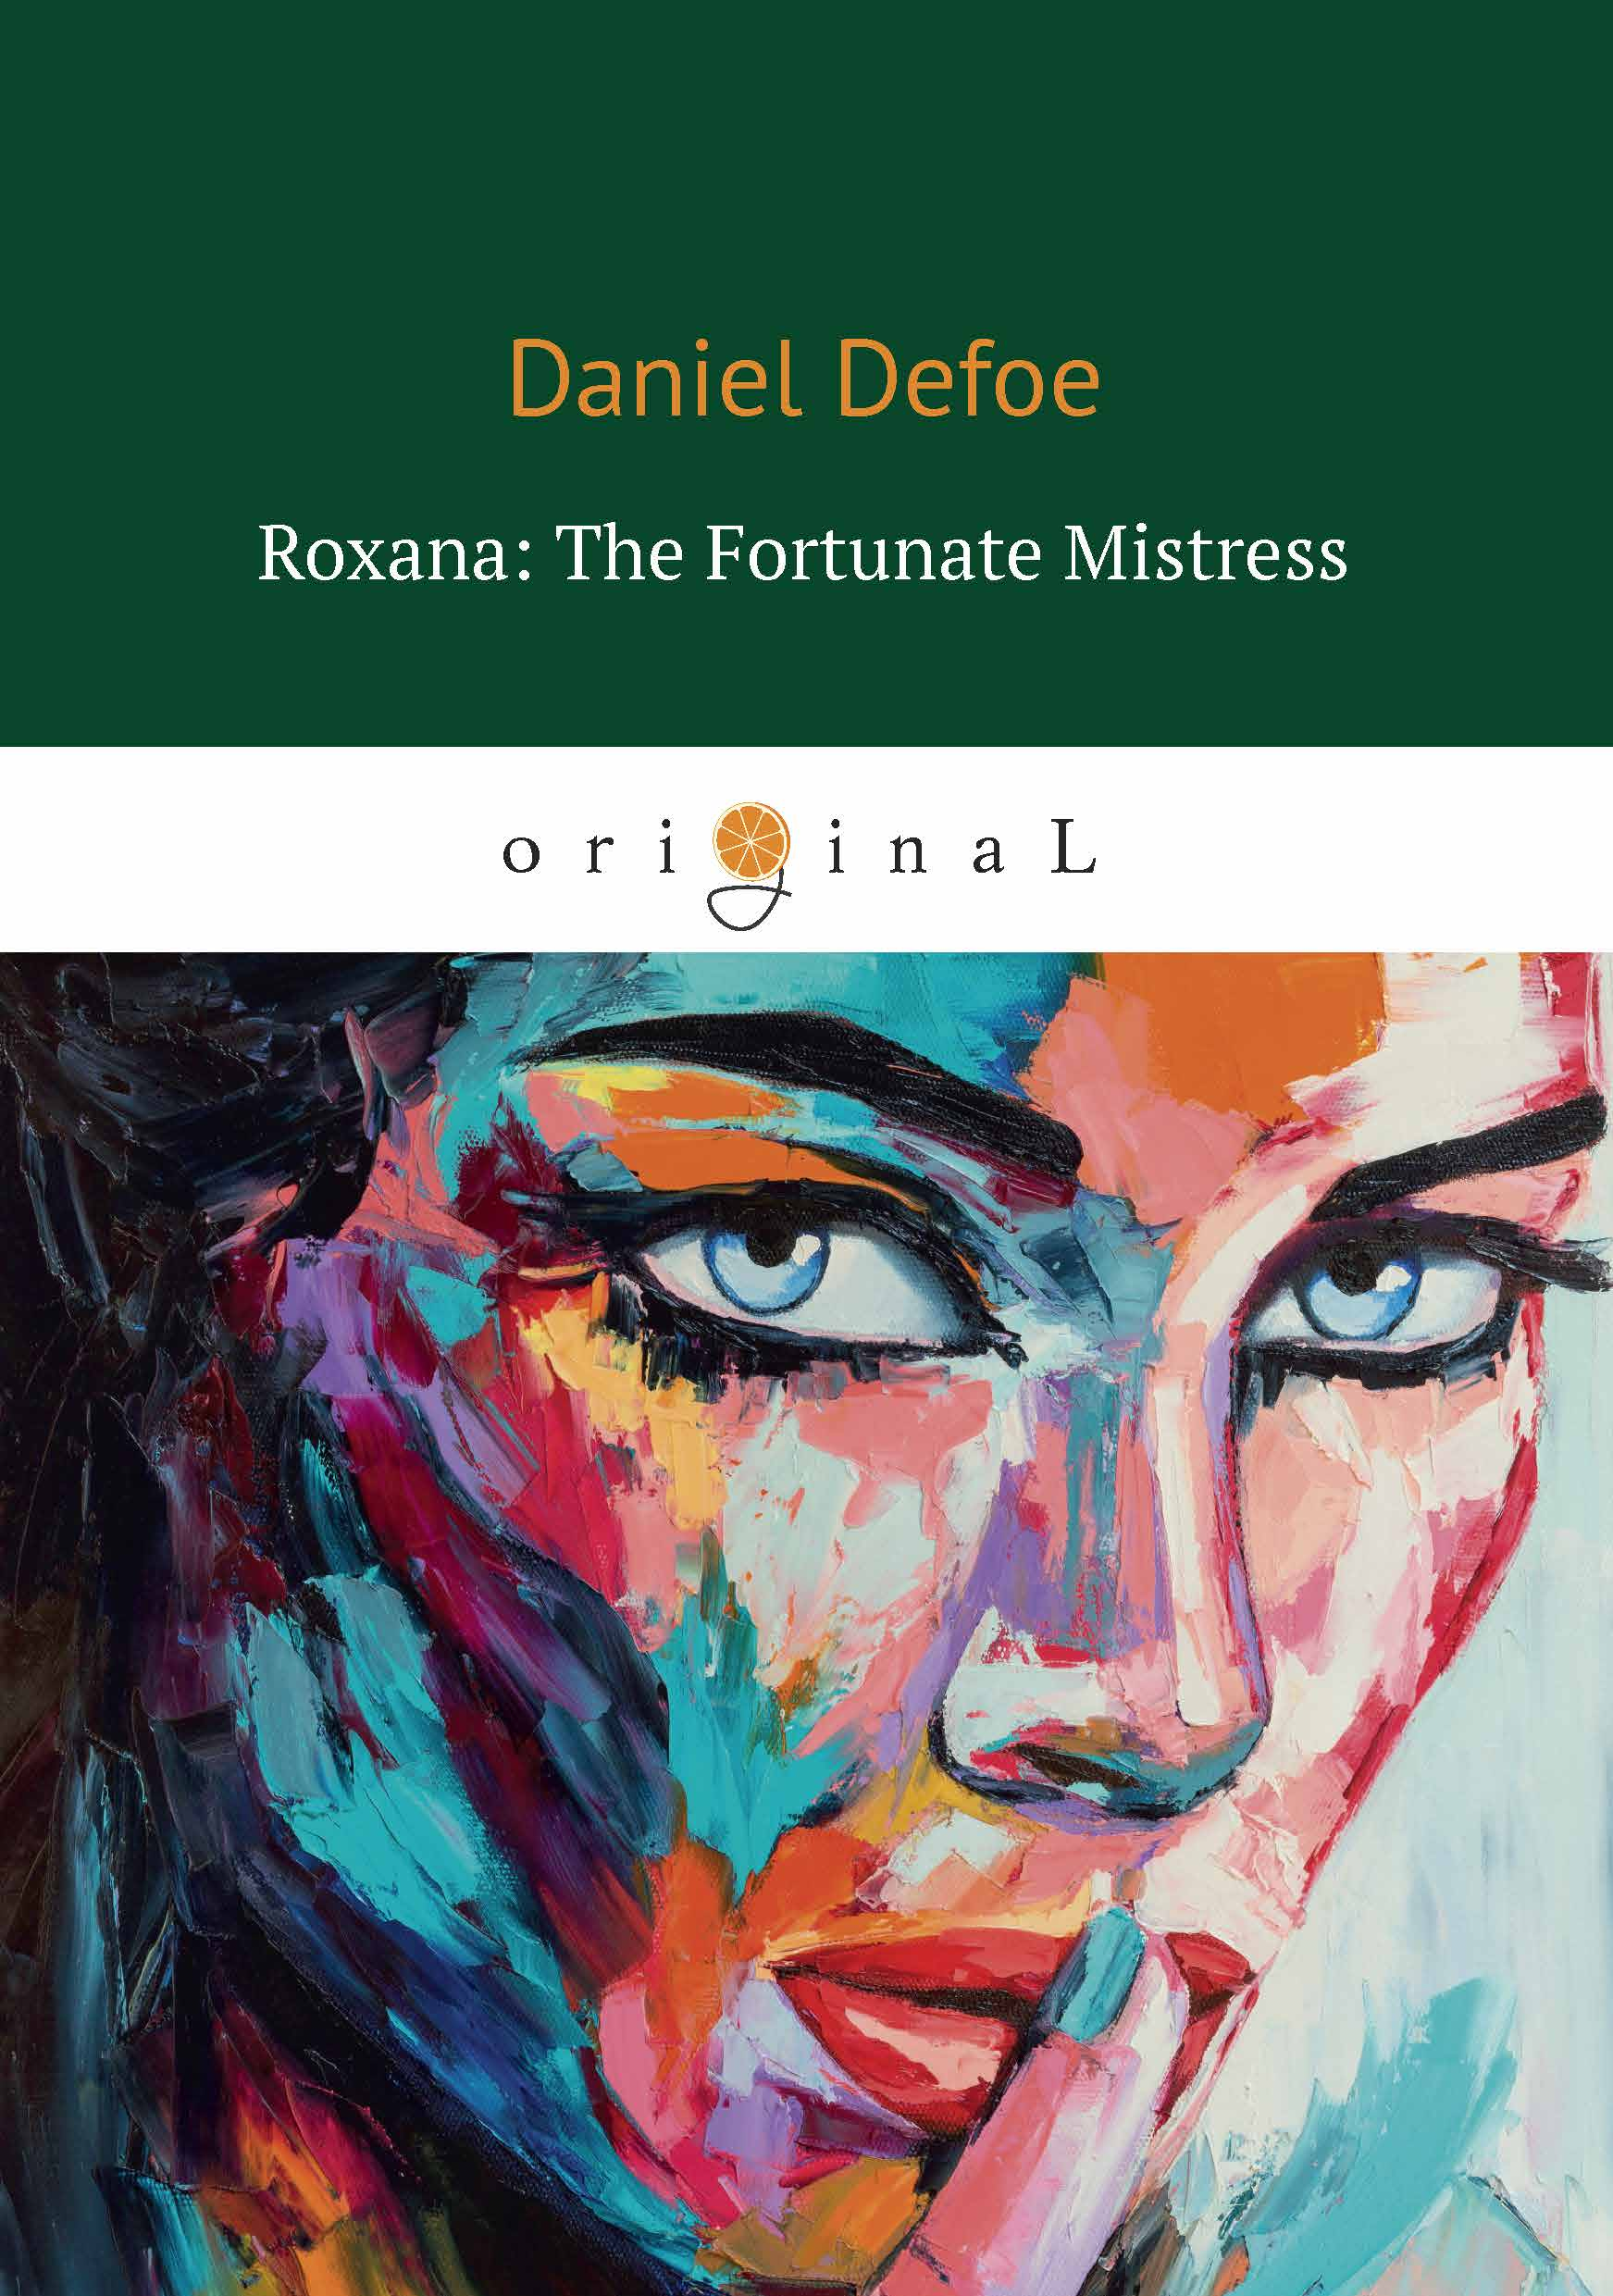 Daniel Defoe Roxana: The Fortunate Mistress